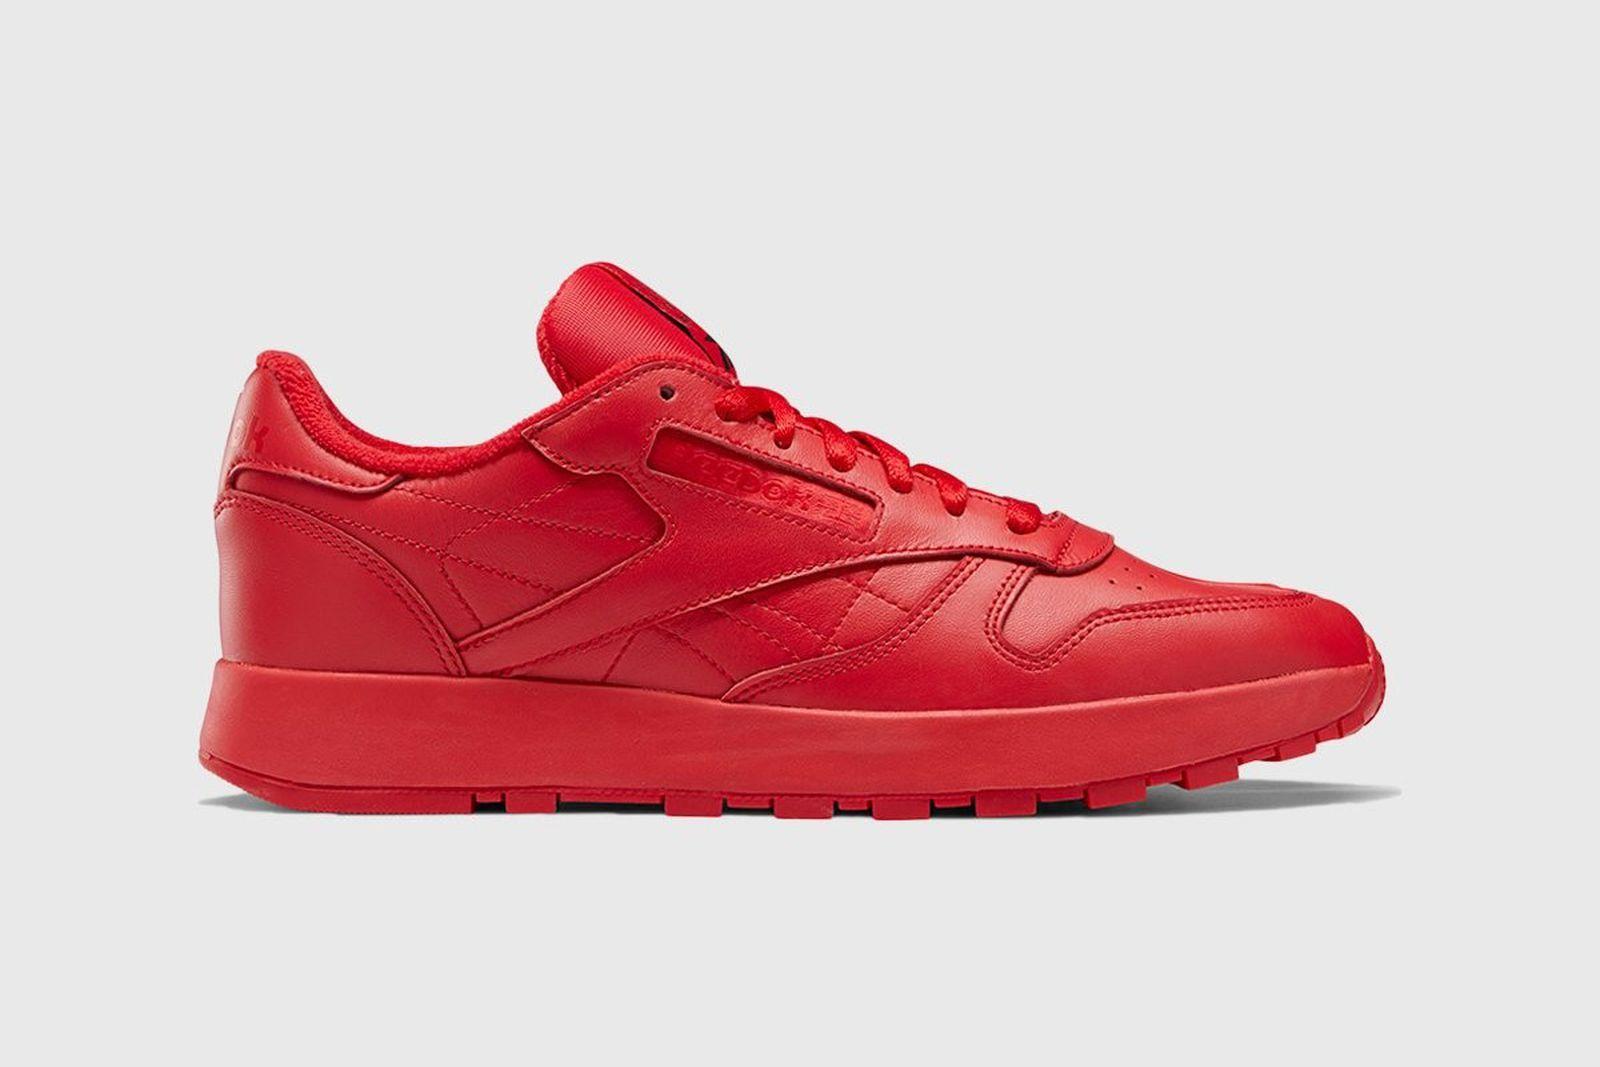 maison-margiela-reebok-classic-leather-tabi-red-grey-release-date-price-12